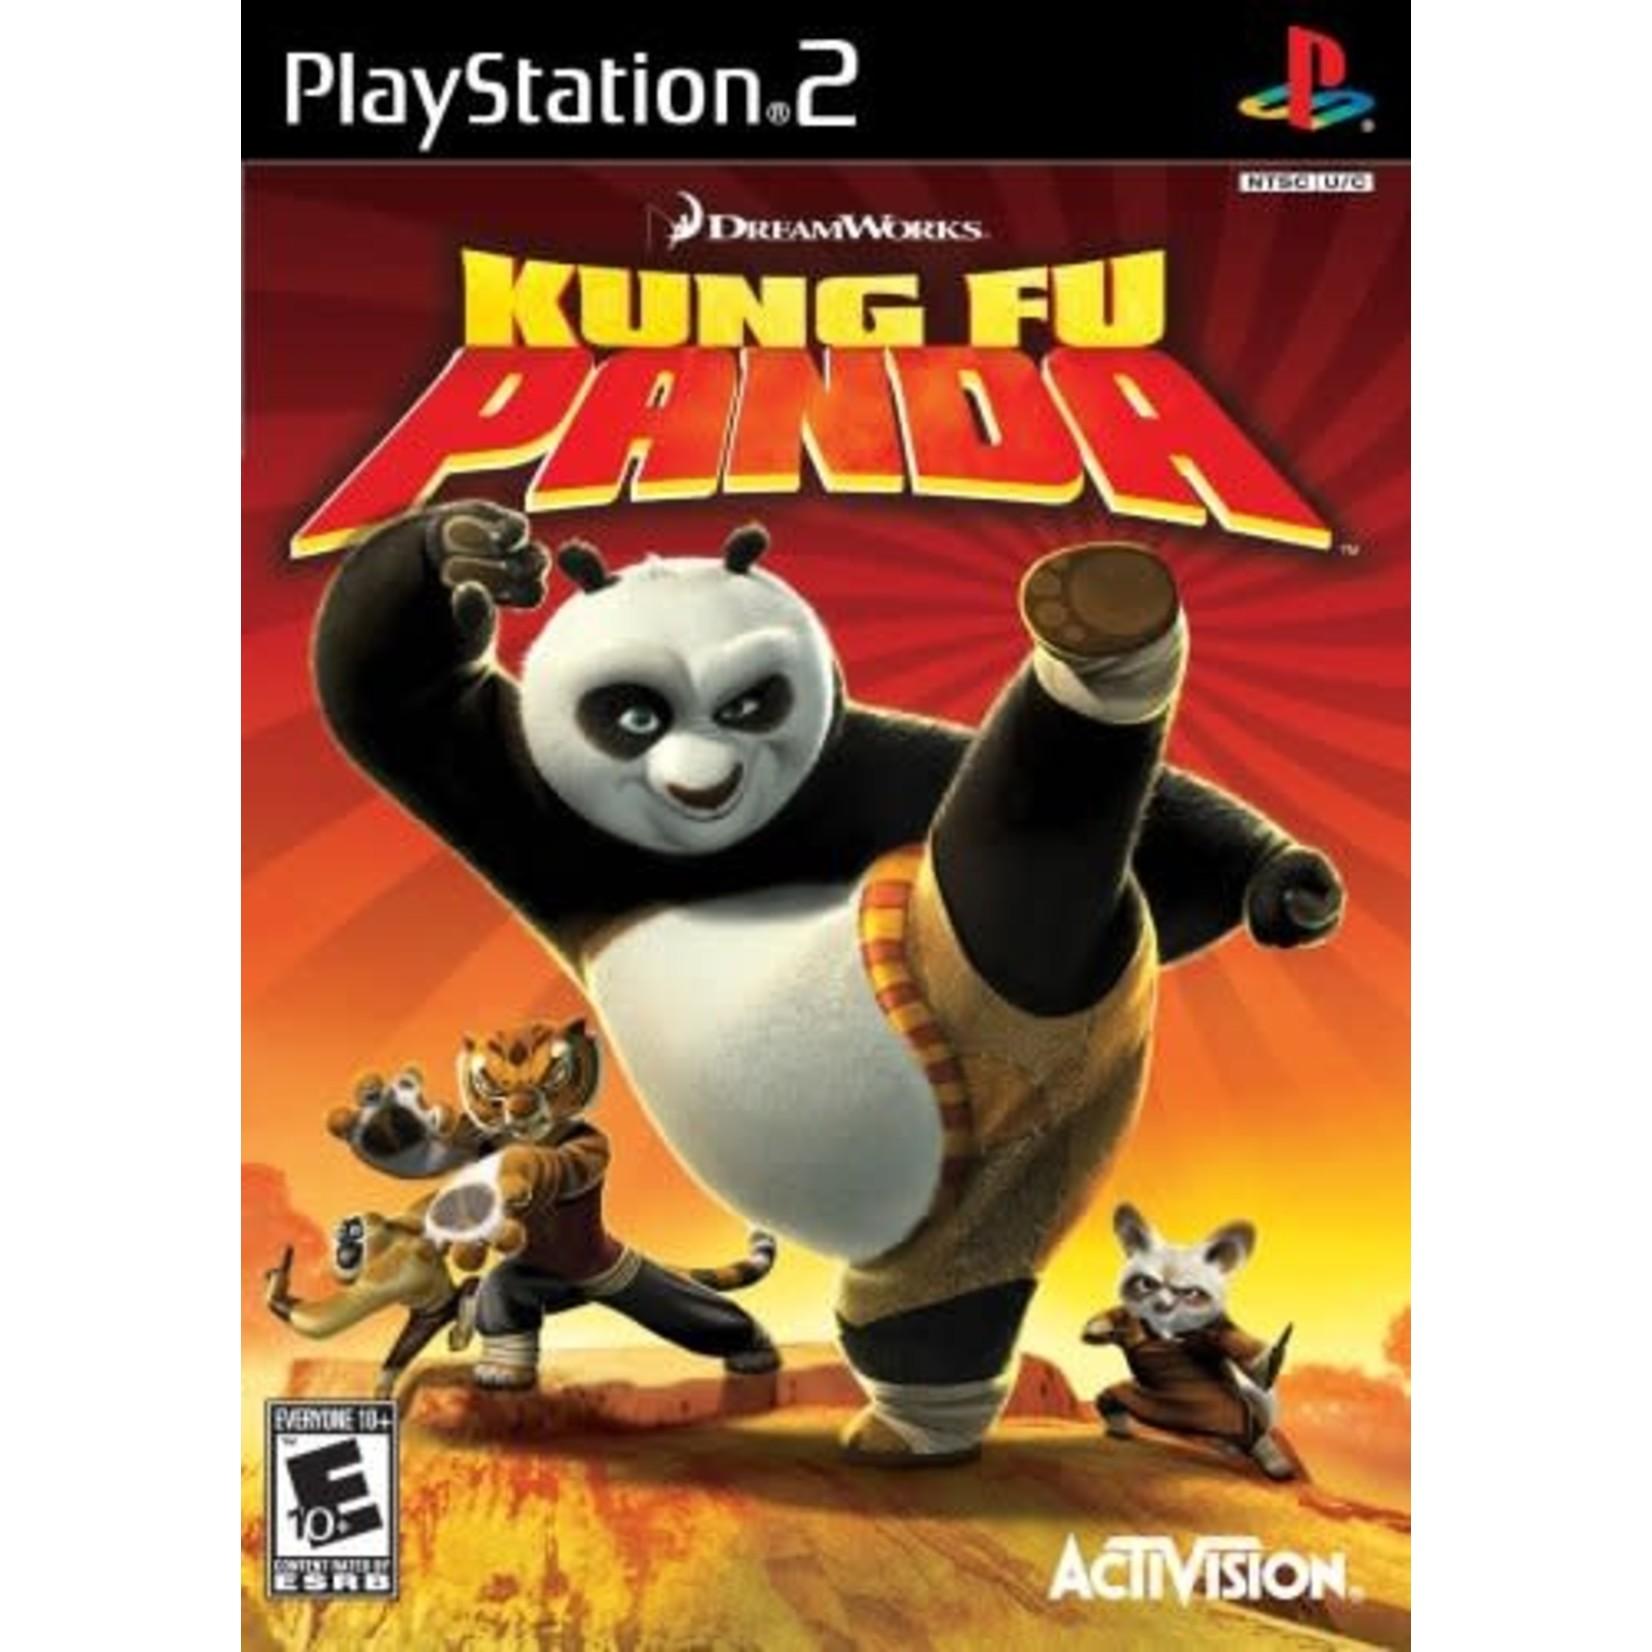 PS2U-Kung Fu Panda